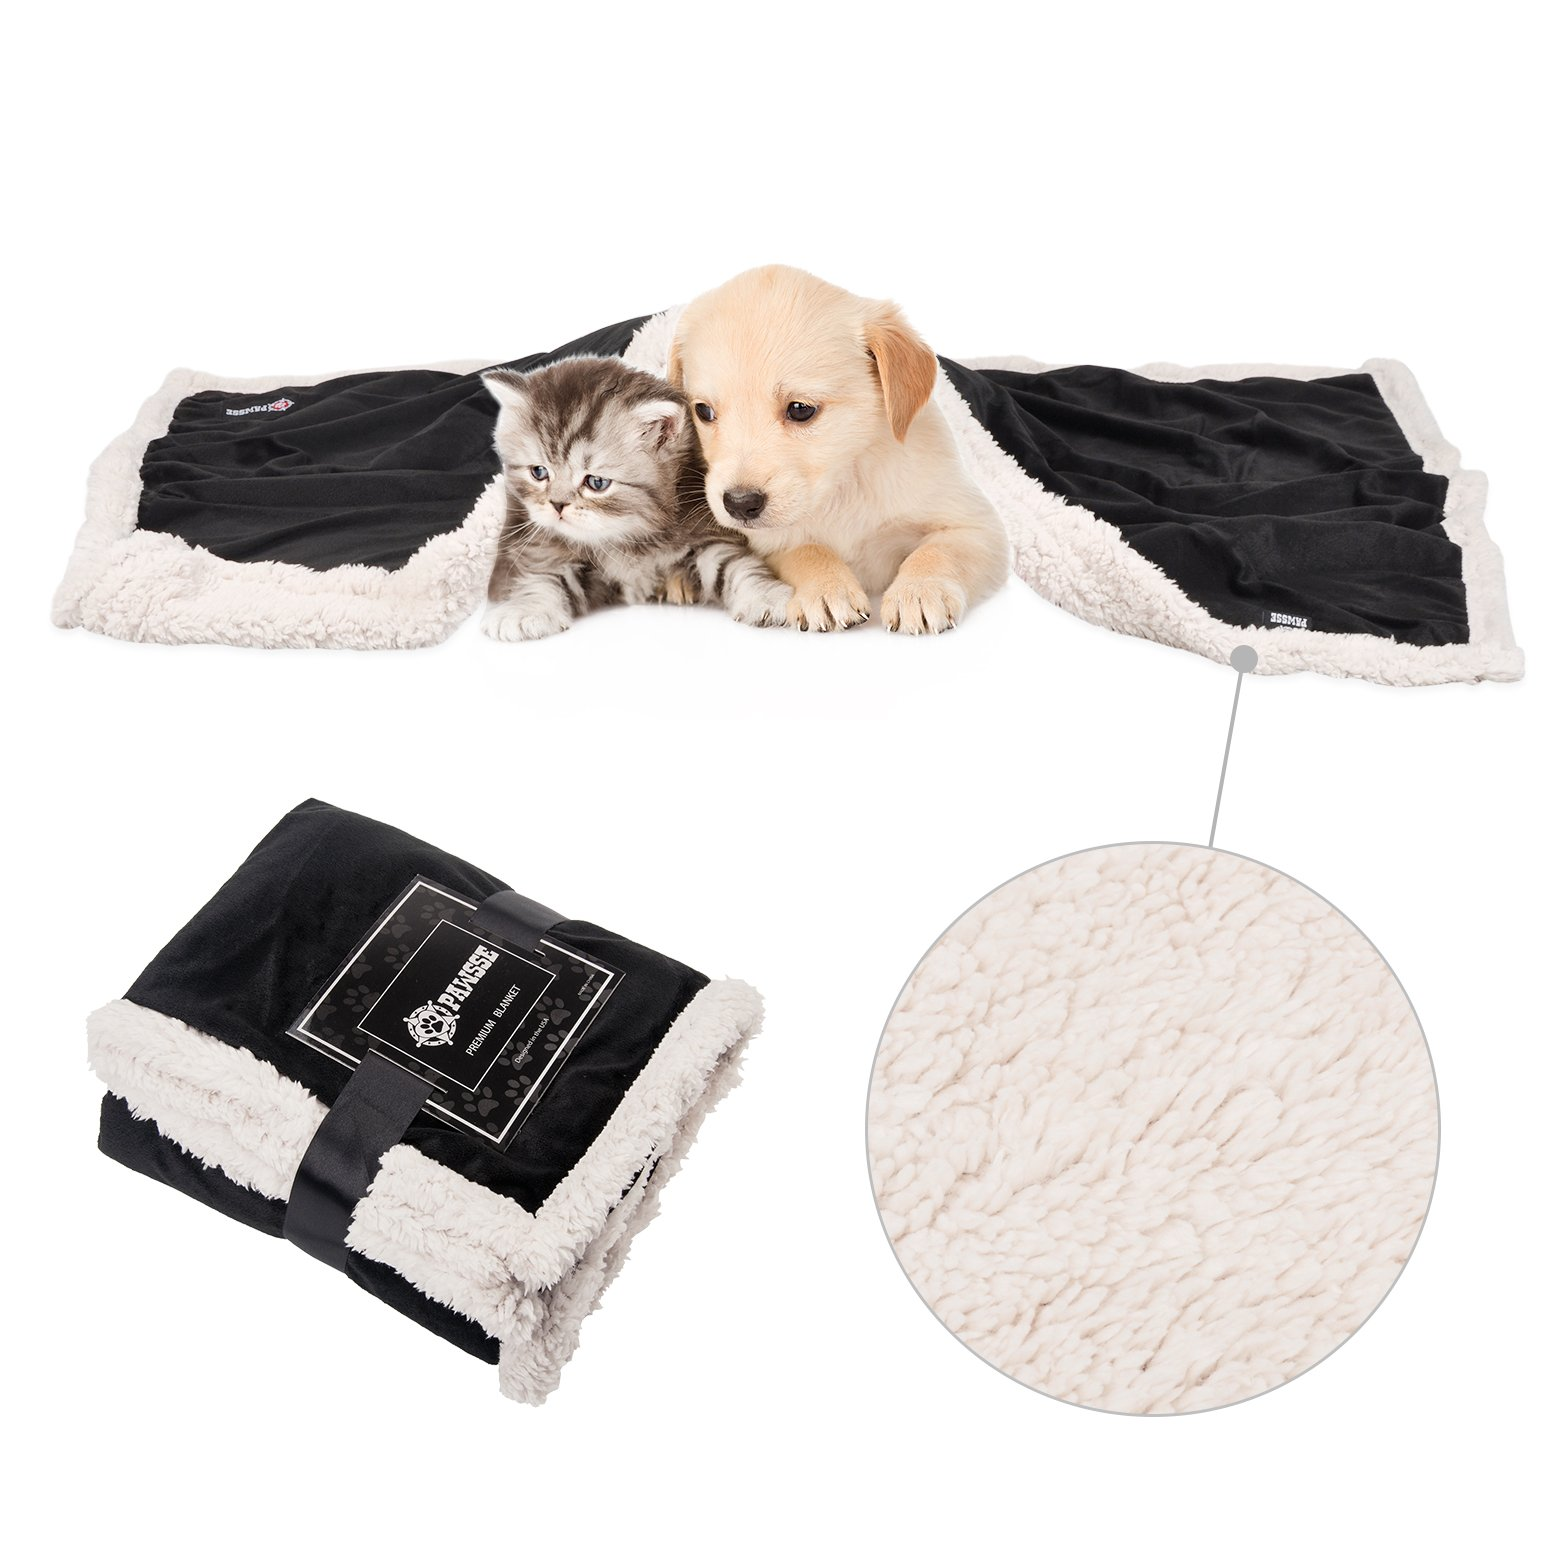 Pawsse Premium Puppy Blanket, Fleece Cat Blanket, Sherpa Throw Pet Mat for Small Animals 114cm x 76cm (45\